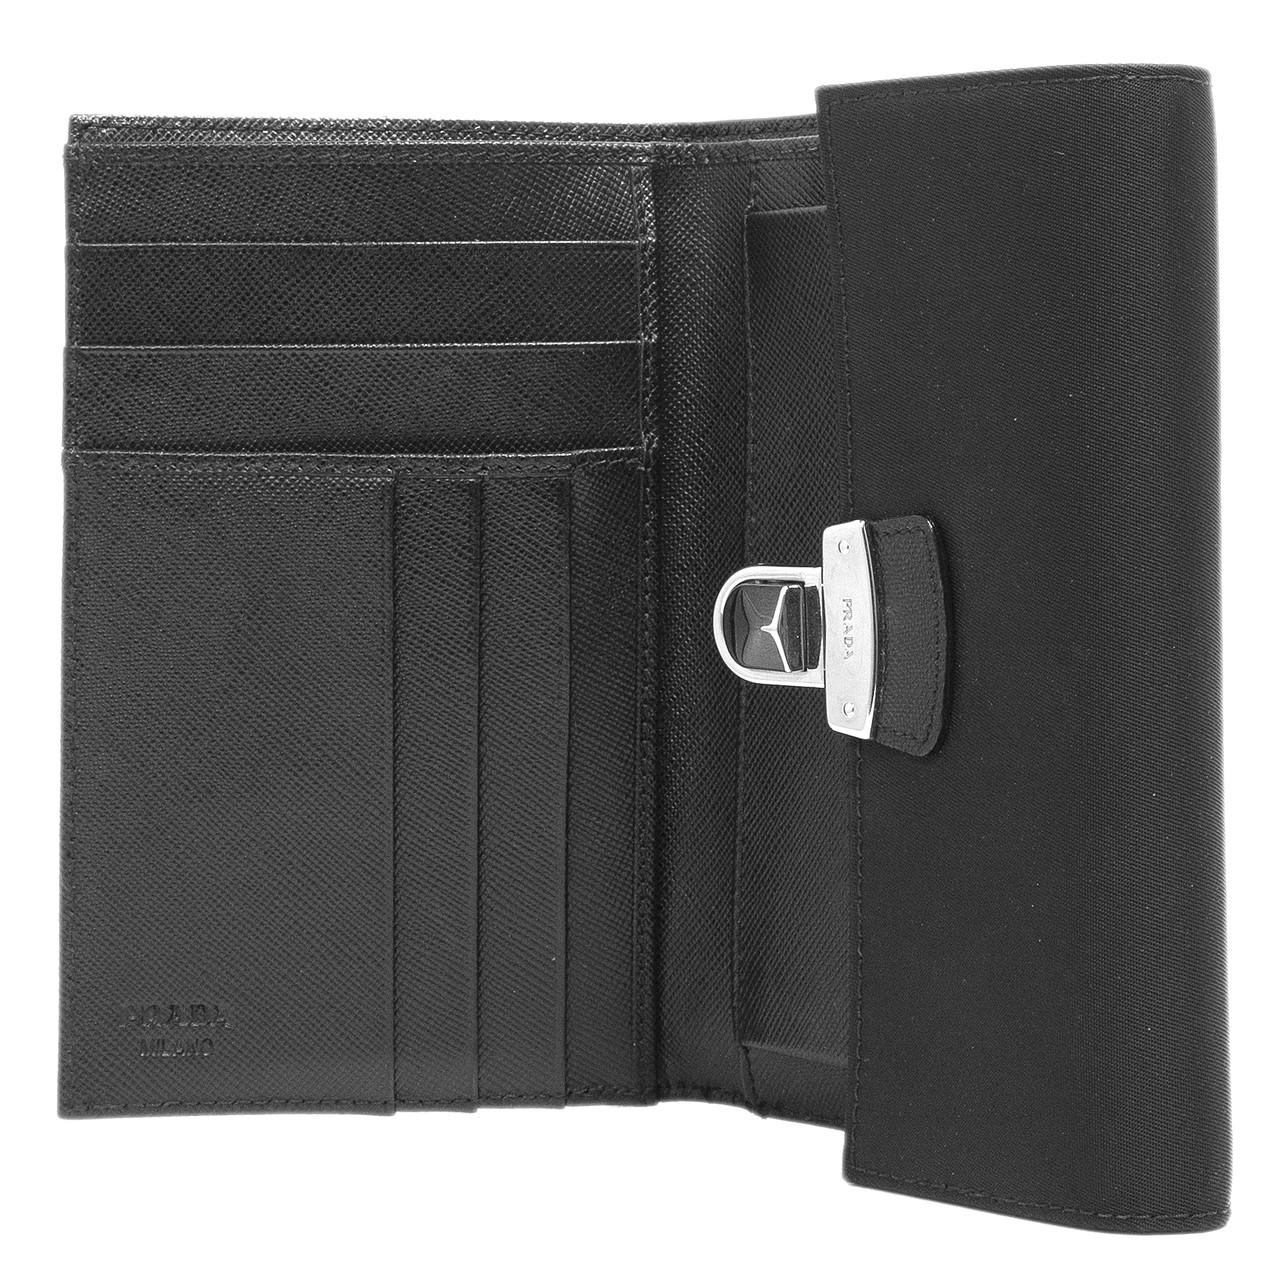 db5aff23c5d6 Prada Nero Tessuto Flap Wallet - modaselle